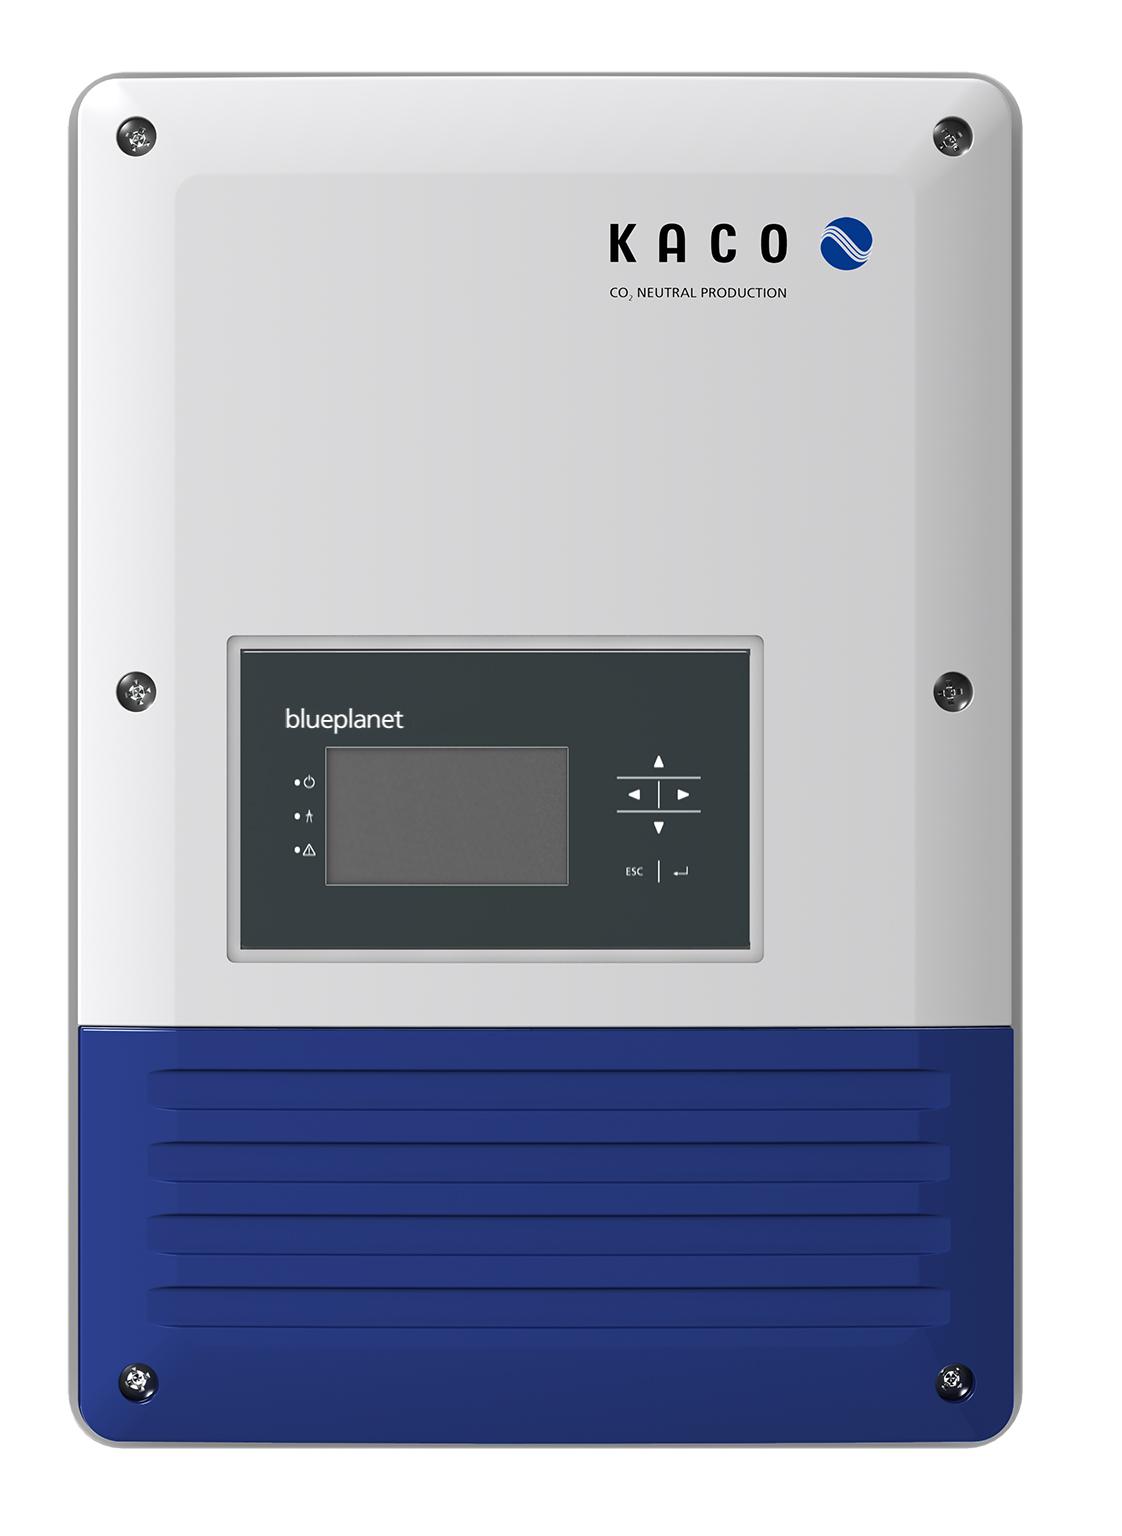 1 Stk Kaco blueplanet 5.0 TL3  3ph IP65 2 MPP-Tracker  PVI50050--